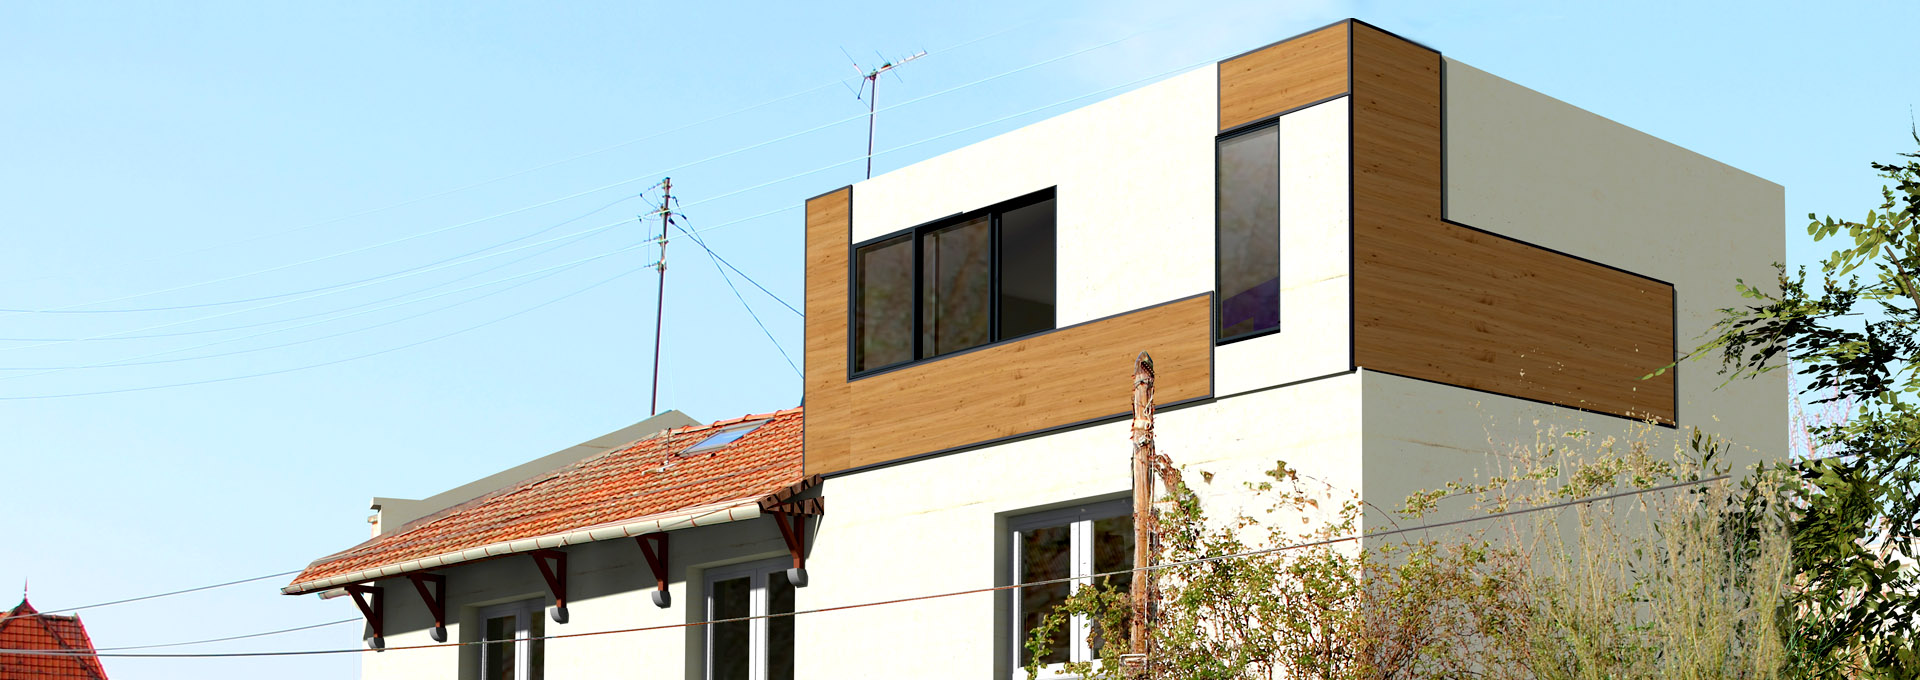 r hausser combles extension terrasse v randa pavillon. Black Bedroom Furniture Sets. Home Design Ideas